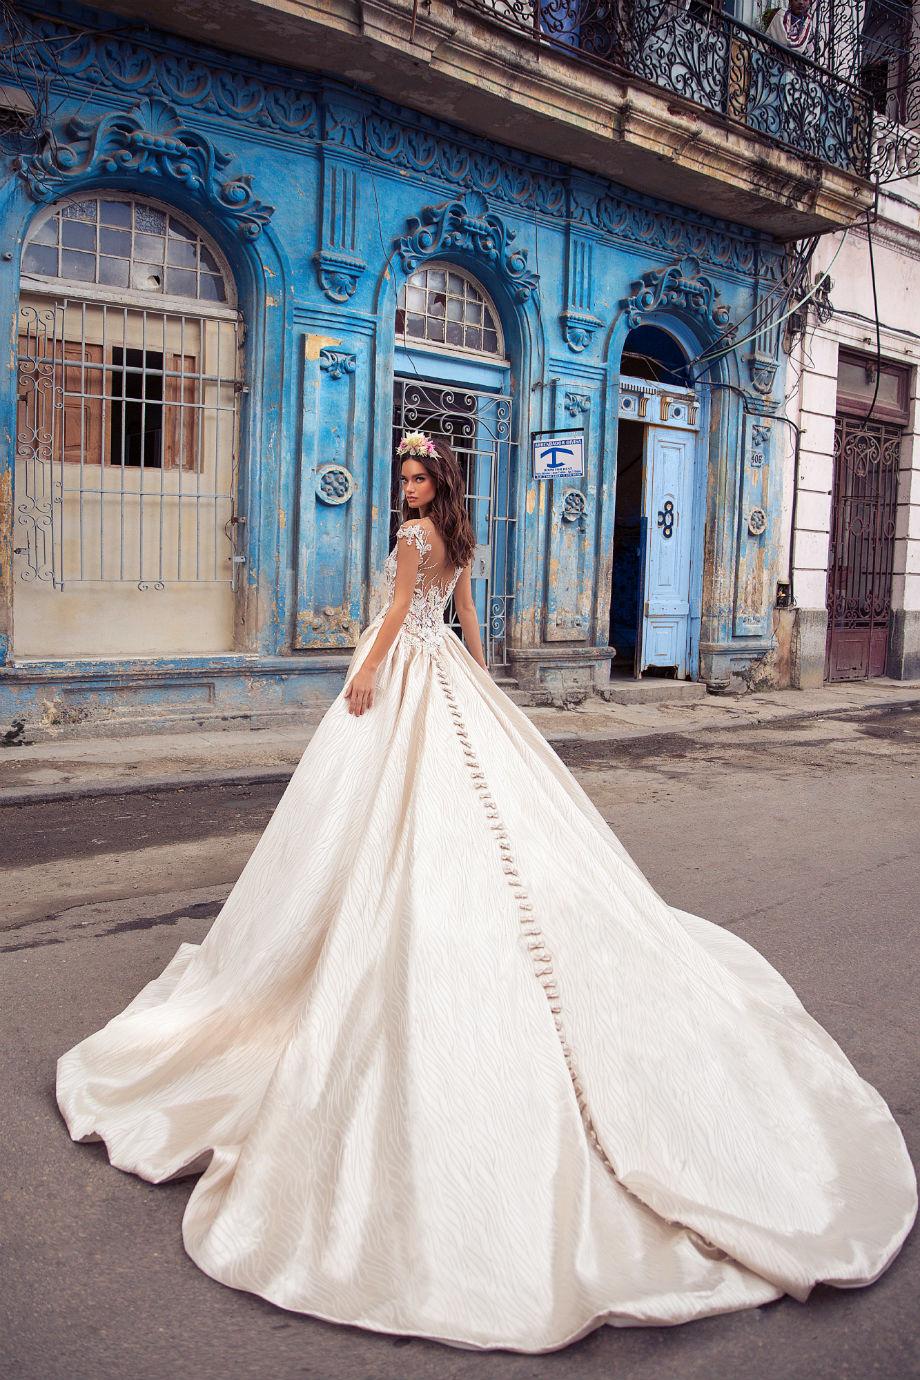 Blushing Bridal Boutique ,MillaNova,lorenzo rossi, Dores , new collection 2018, Havana Campaign,l-wedding-wedding gown-Mississauga-woodbridge-vaughan-toronto-gta-ontario-canada-montreal-buffalo-NYC-california